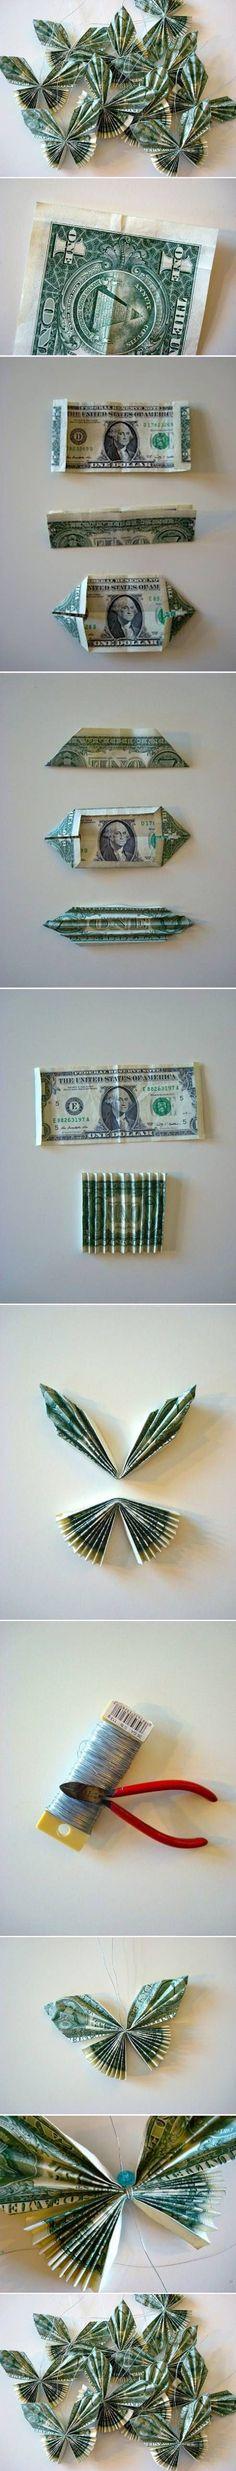 DIY Money Bill Butterfly